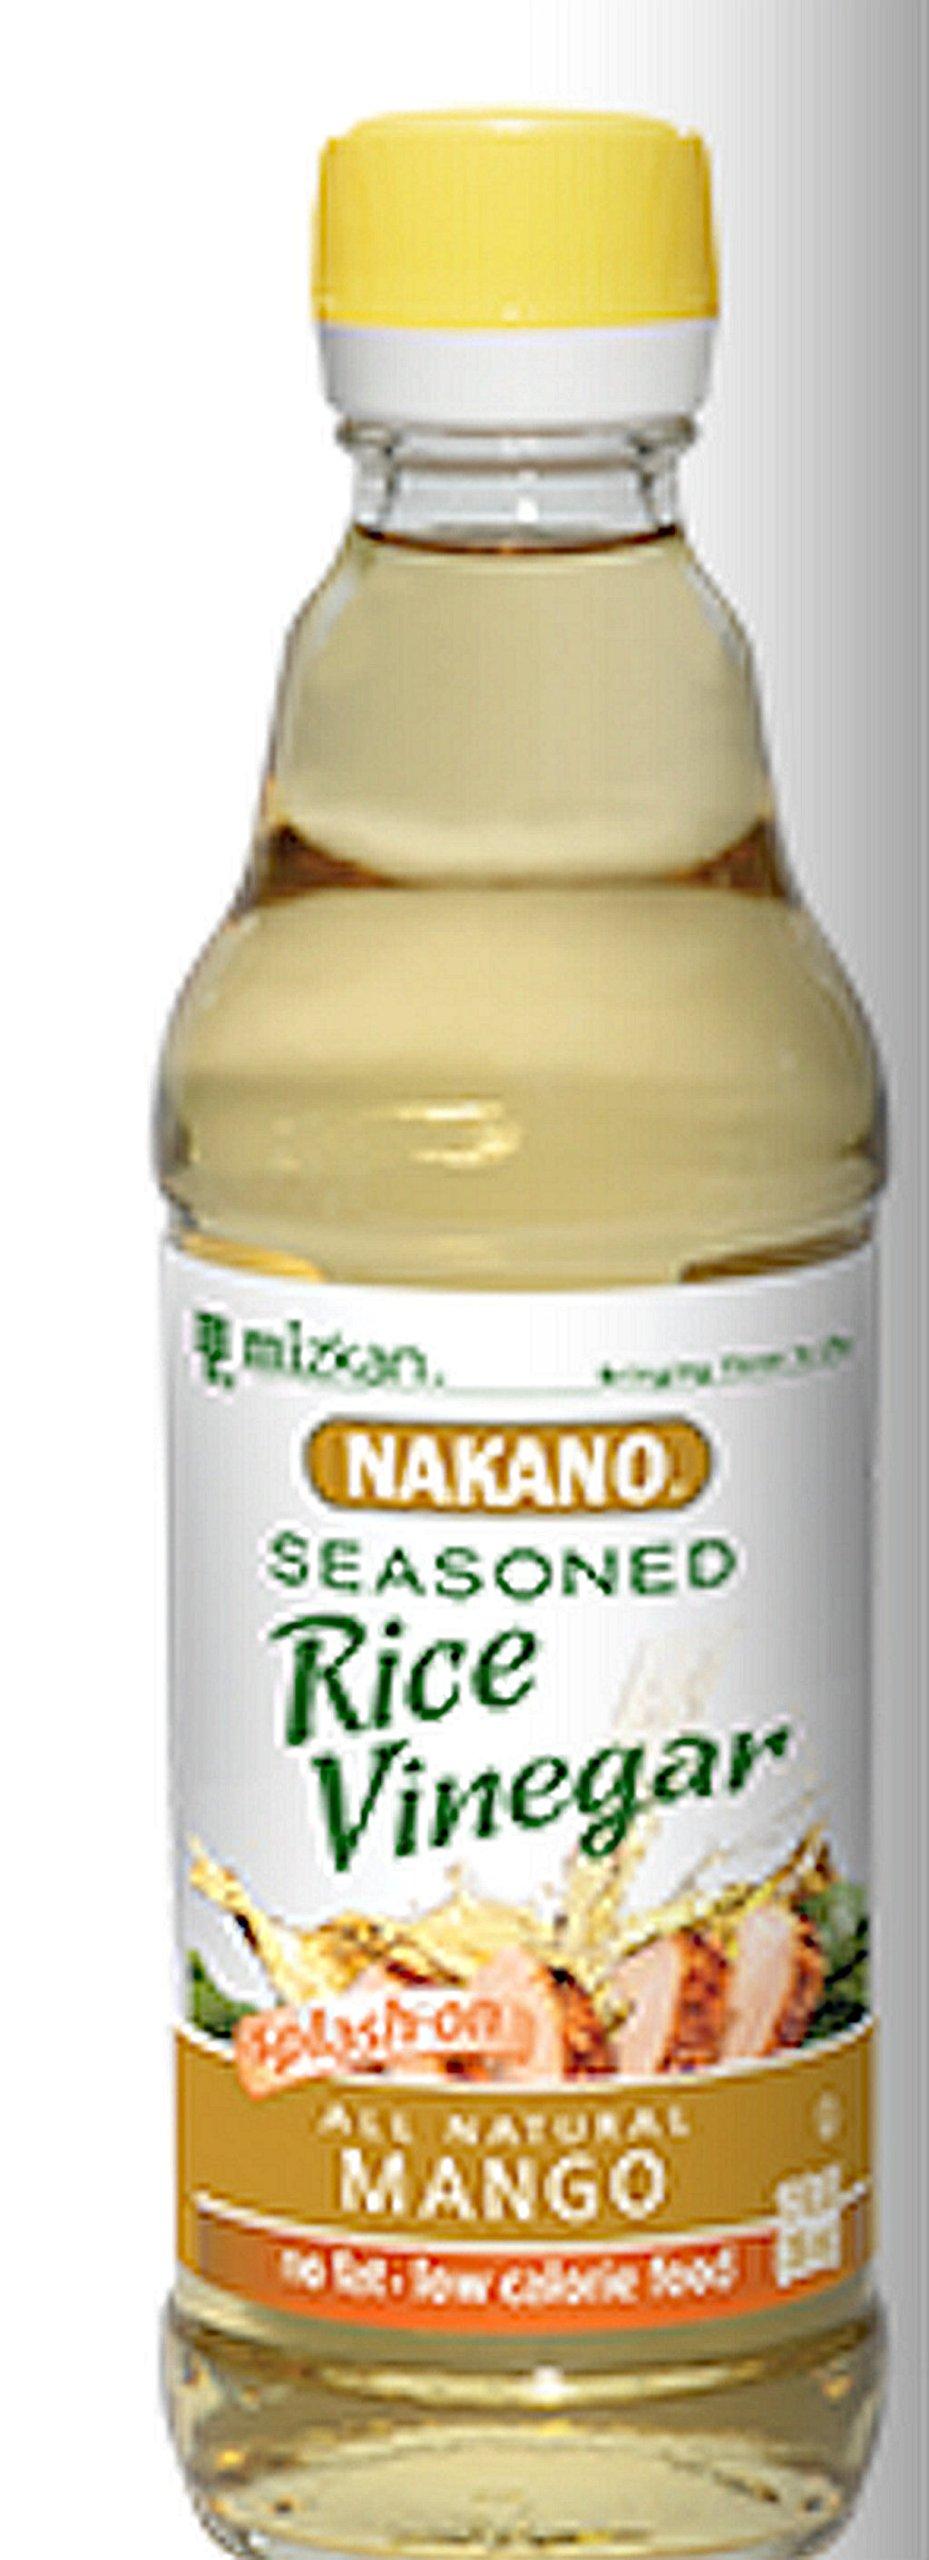 Nakano Mango Seasoned Rice Vinegar